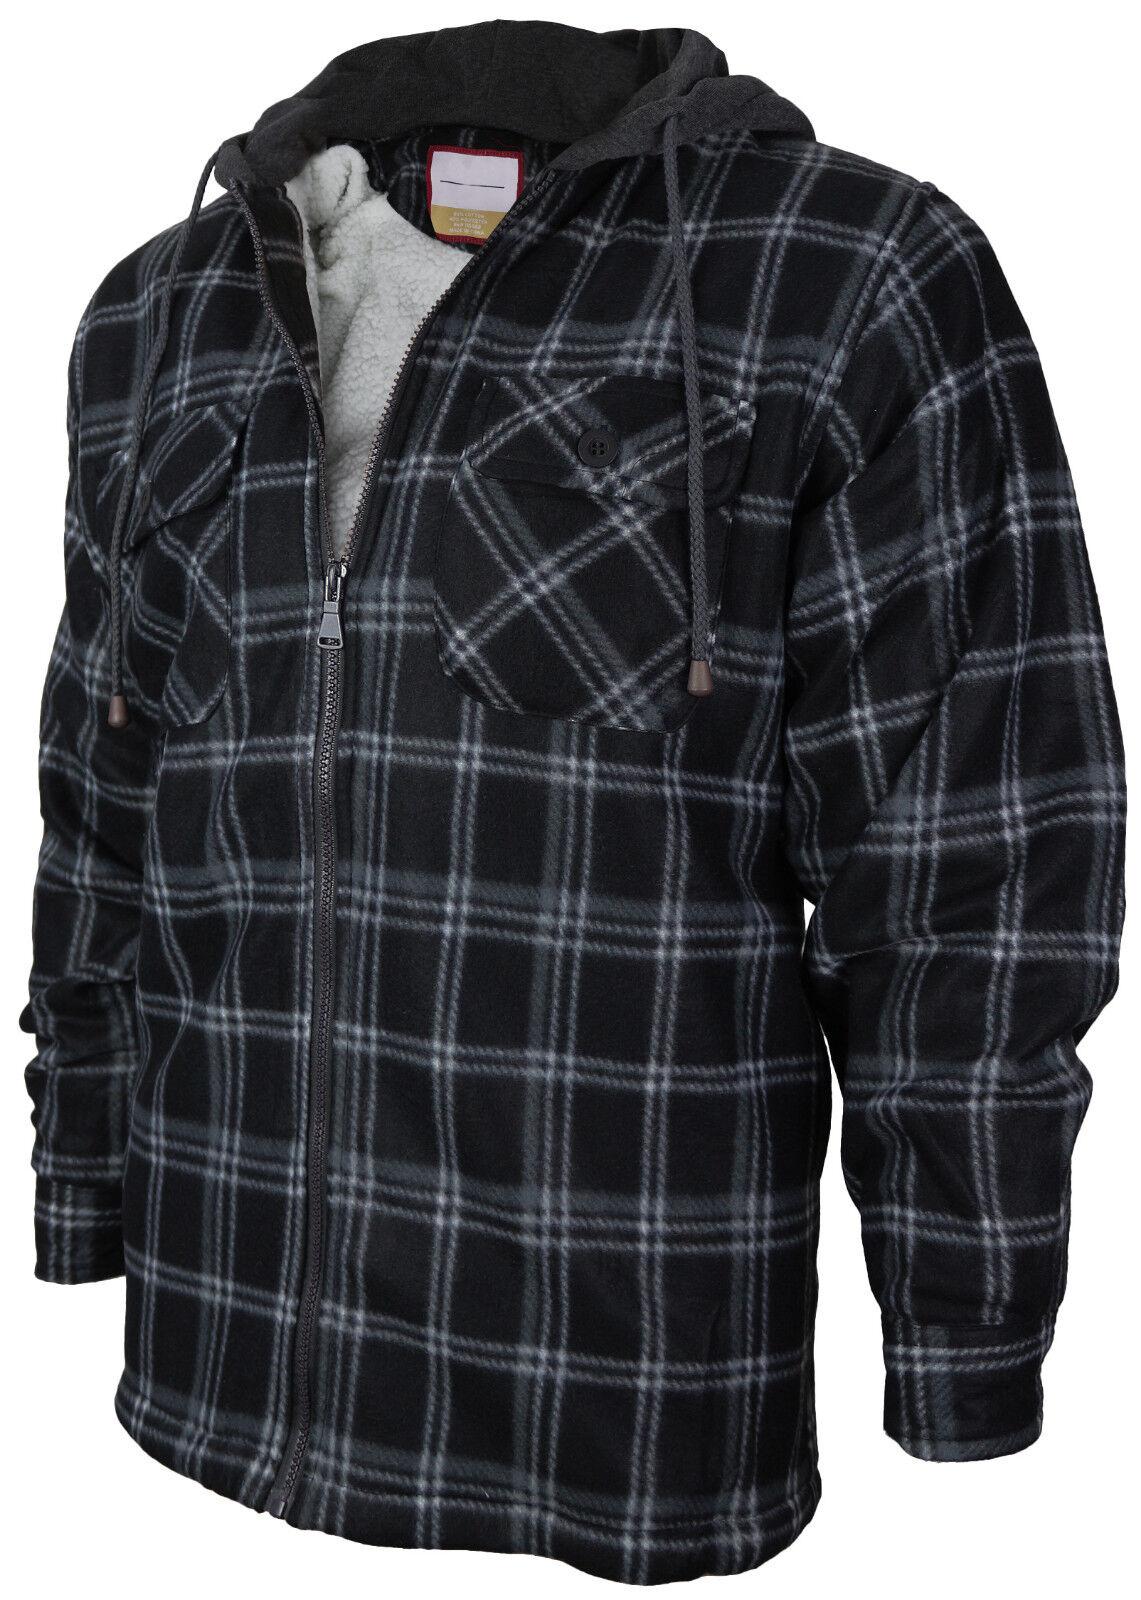 Men's Heavy Fleece Lined Sherpa Hoodie Plaid Flannel Jacket With Hood E03 - Charcoal Grey White